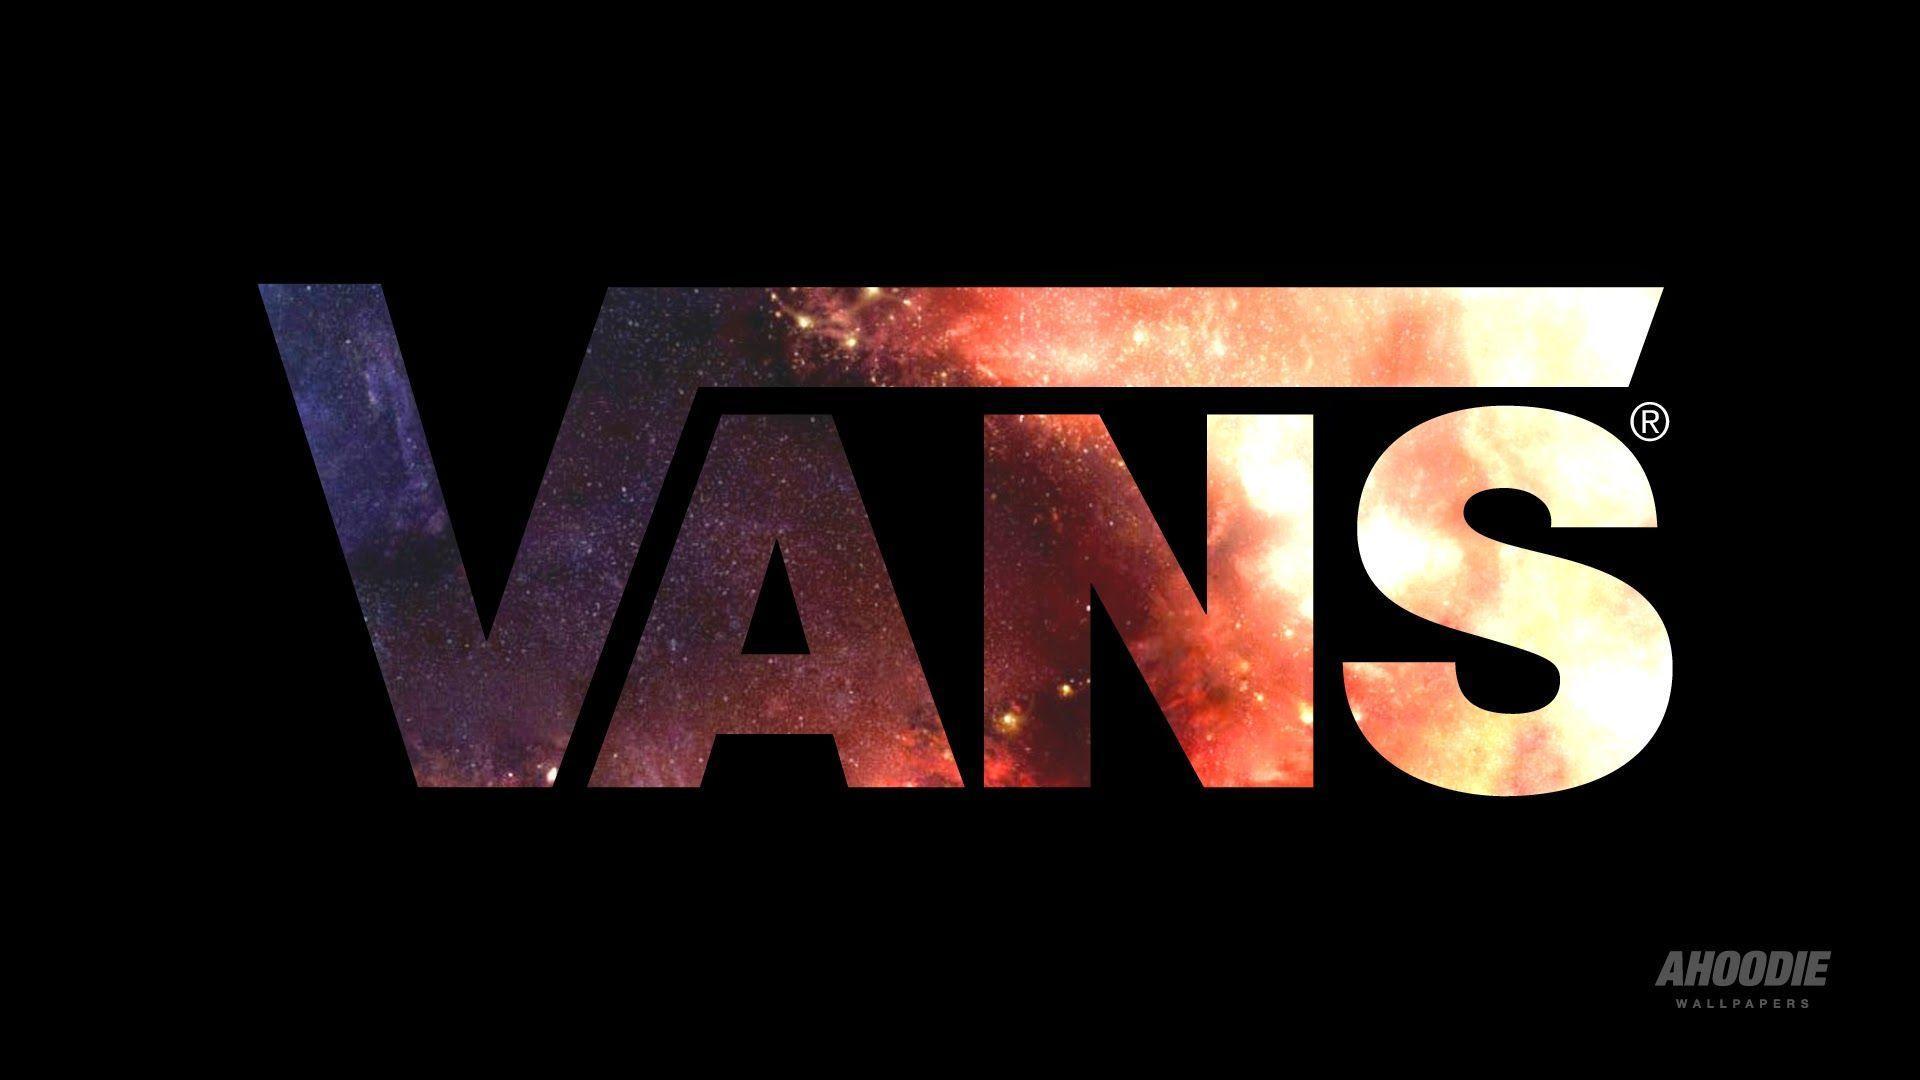 8ab7120d8f2b 25 best ideas about Vans wallpaper iphone on Pinterest